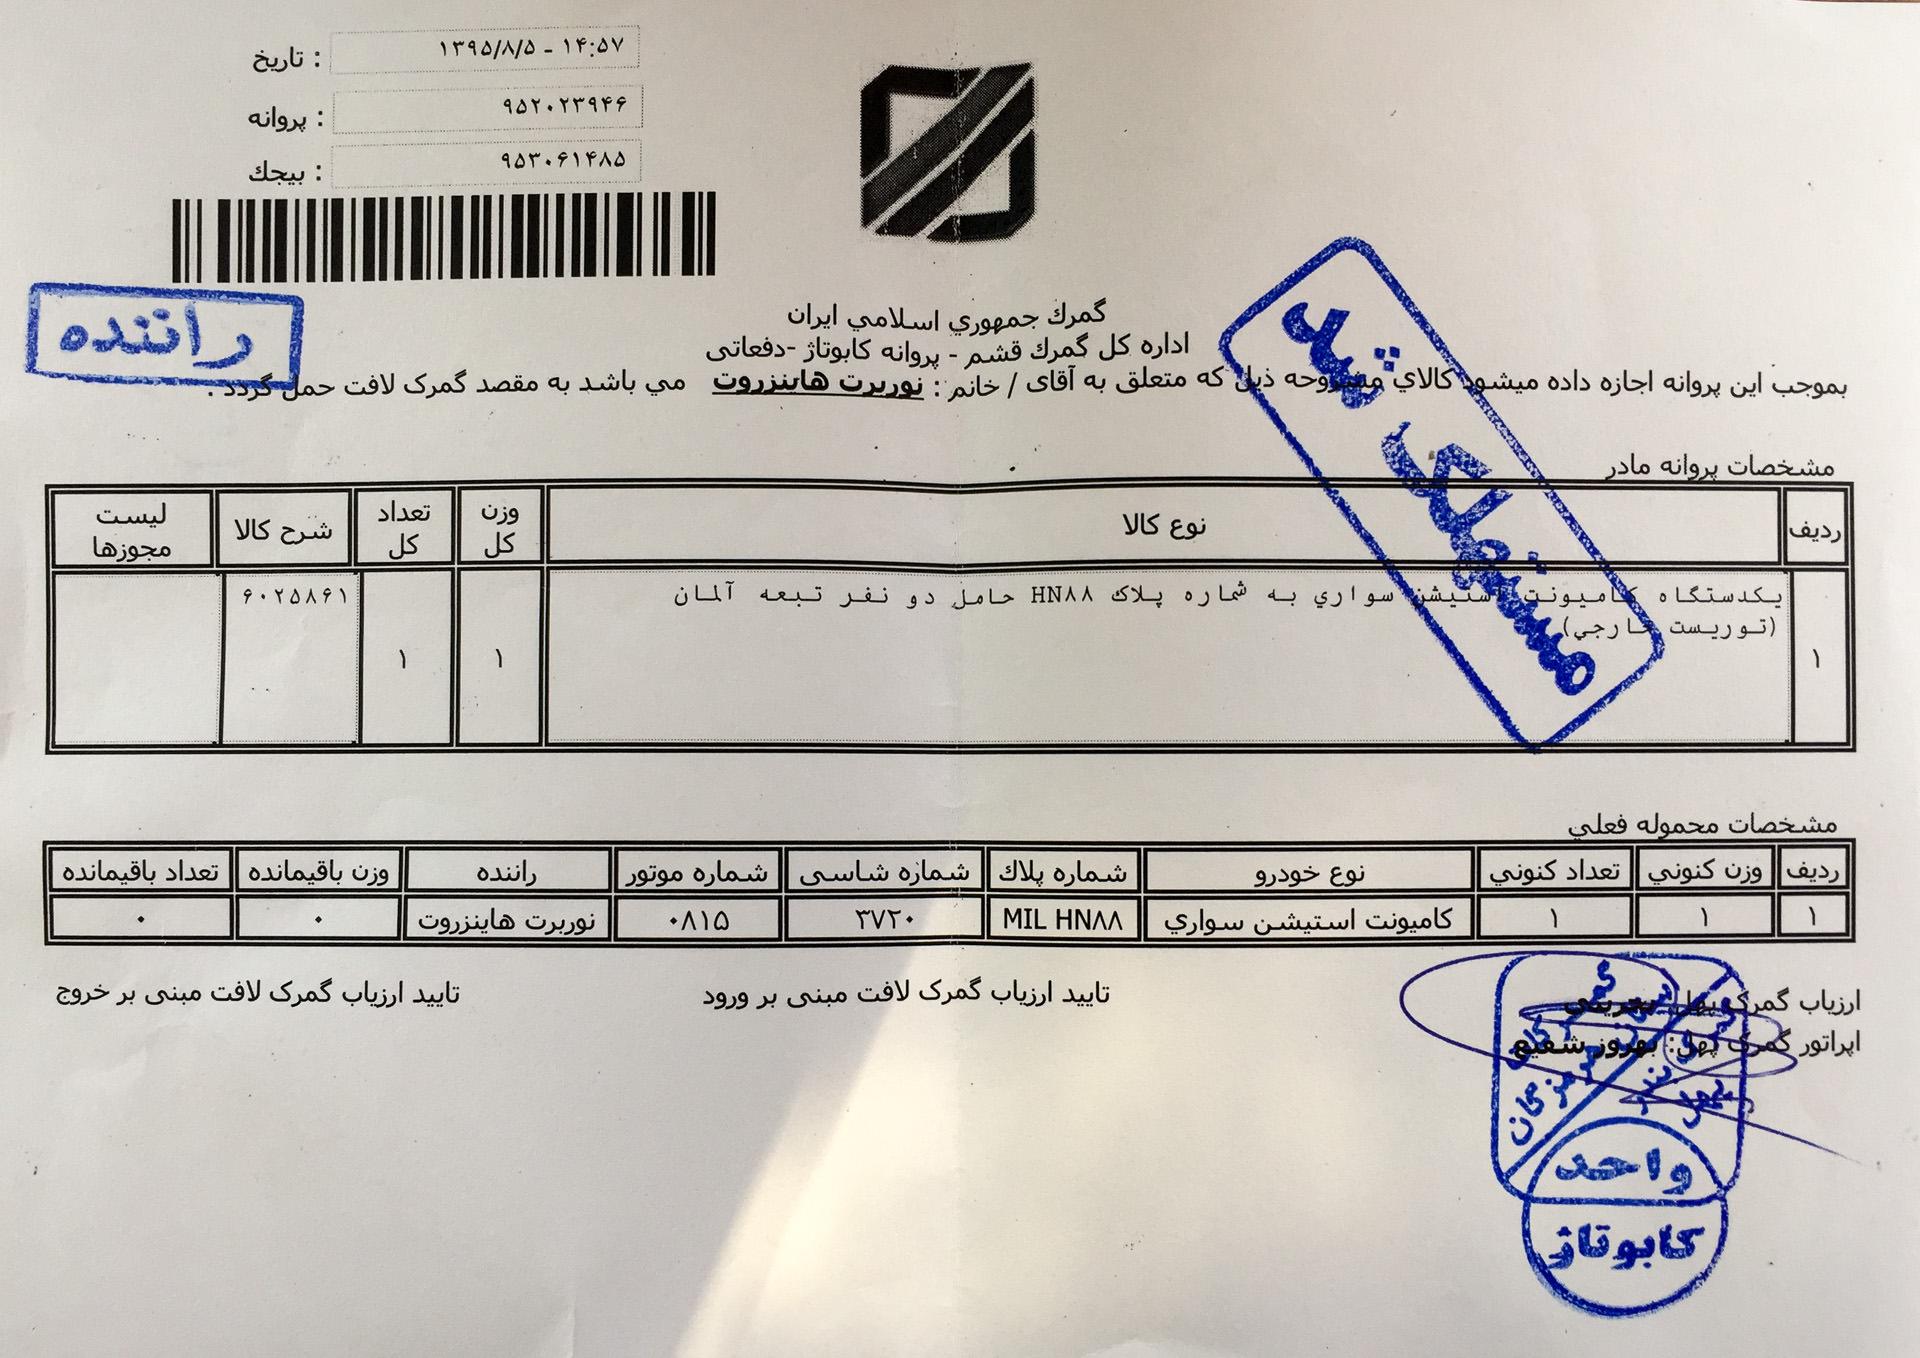 Qeshm - Paperwork